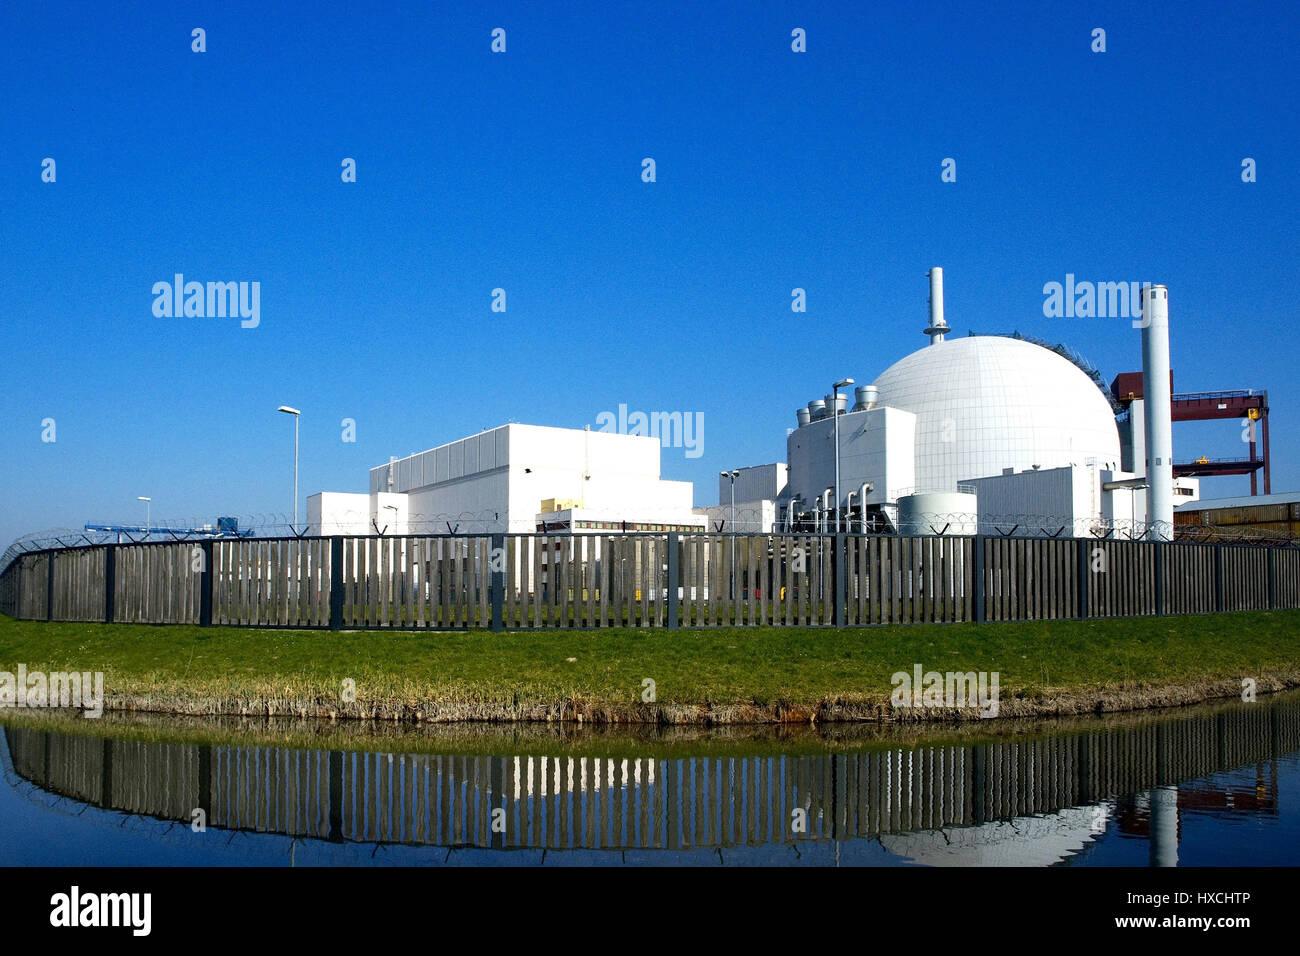 Nuclear power plant village Brok, Kernkraftwerk Brokdorf - Stock Image